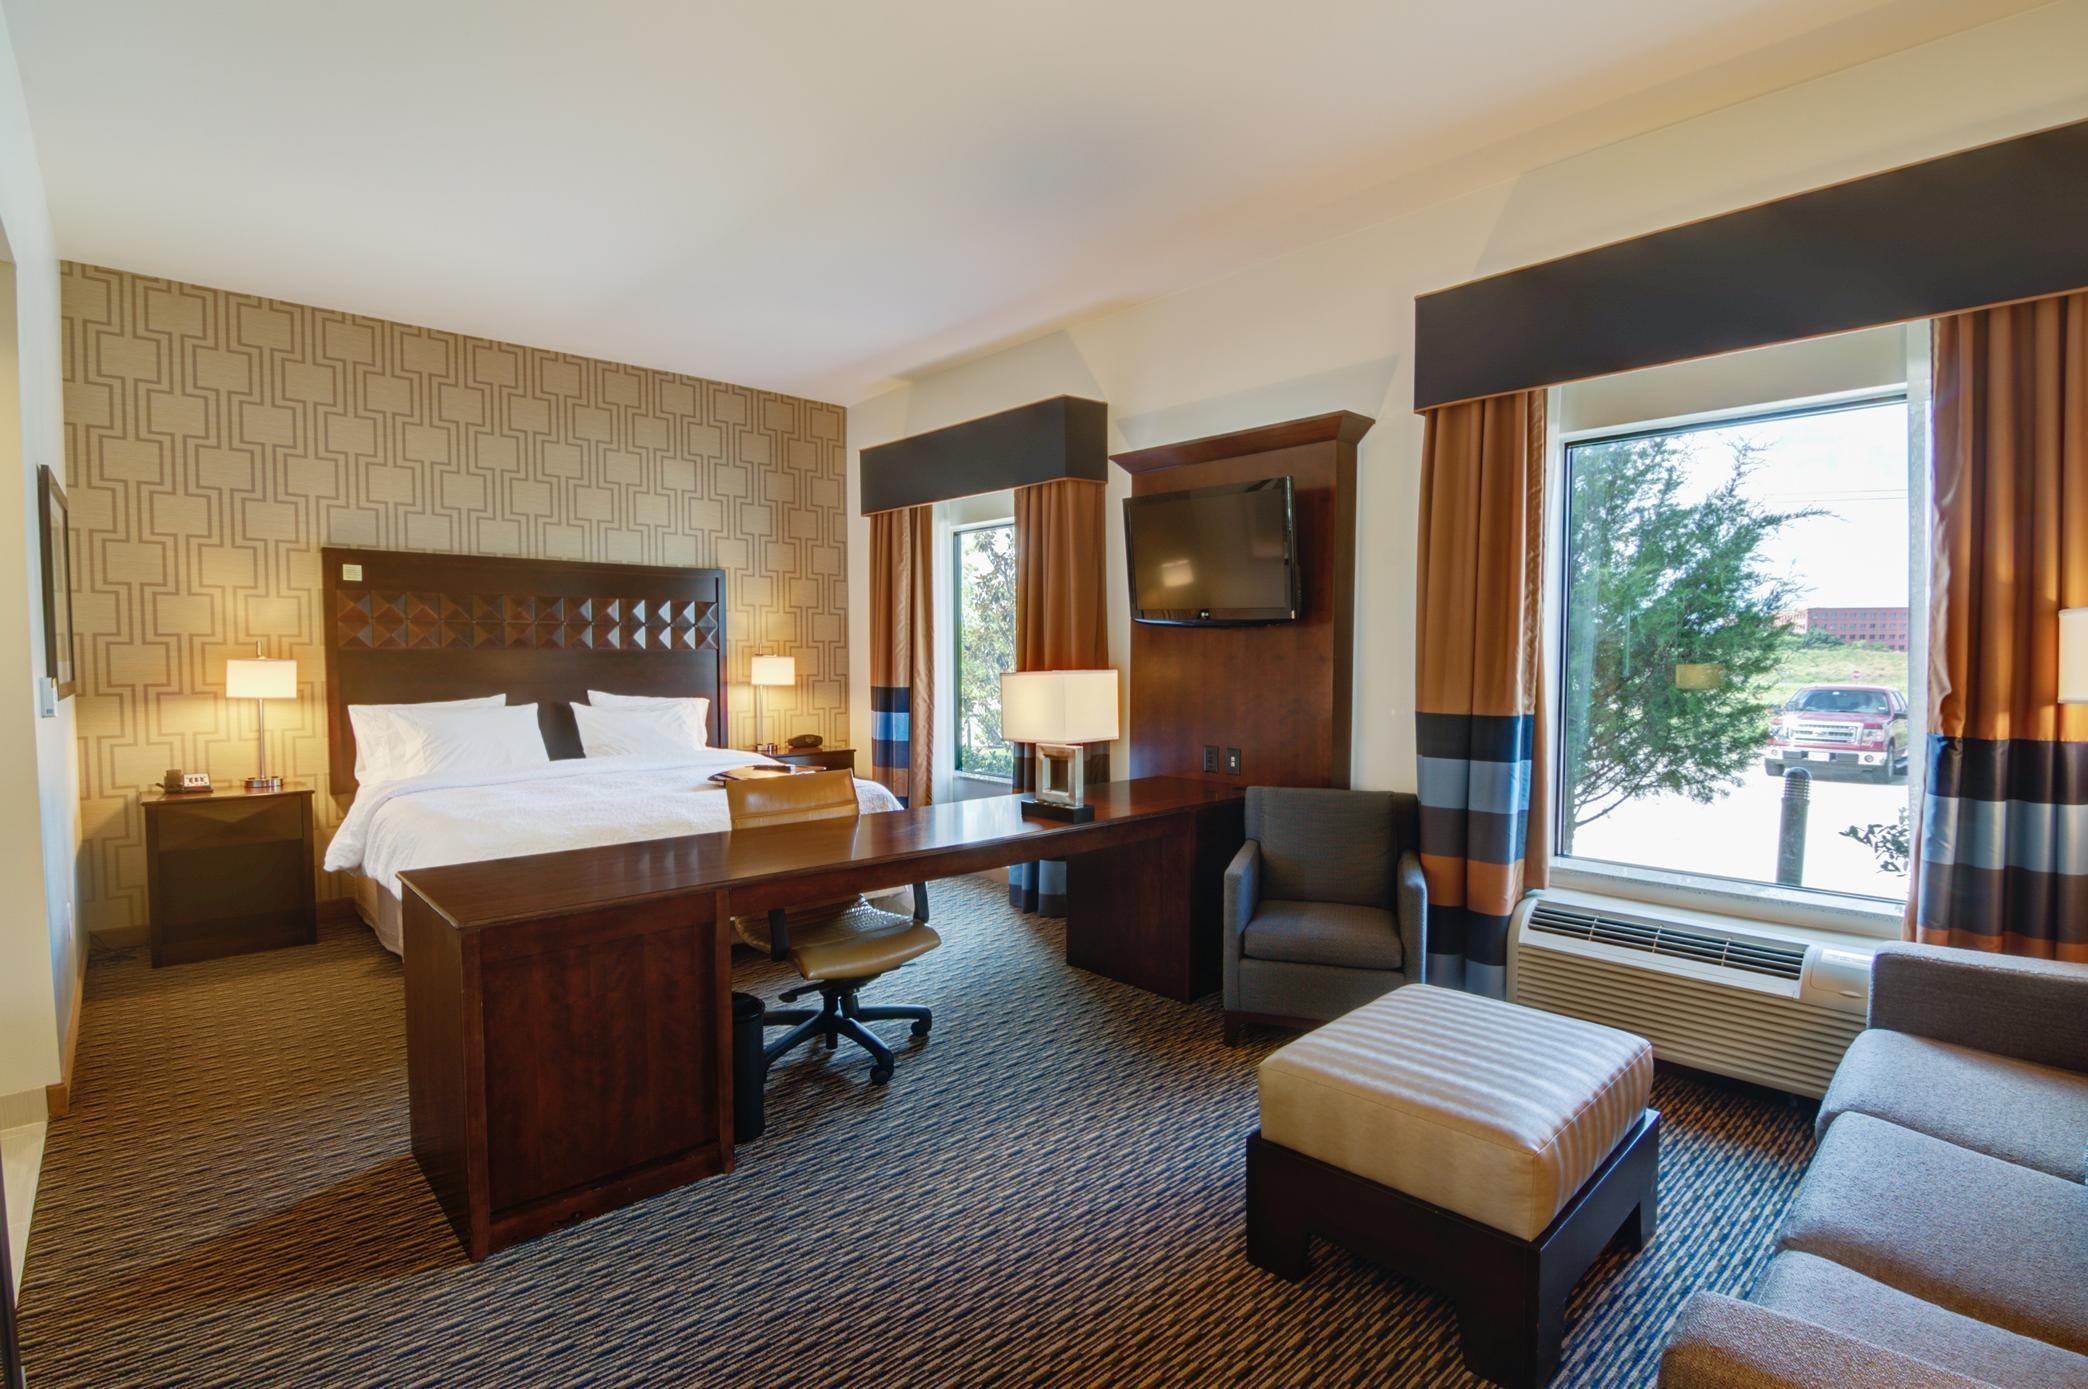 Hampton Inn & Suites Trophy Club - Fort Worth North image 24